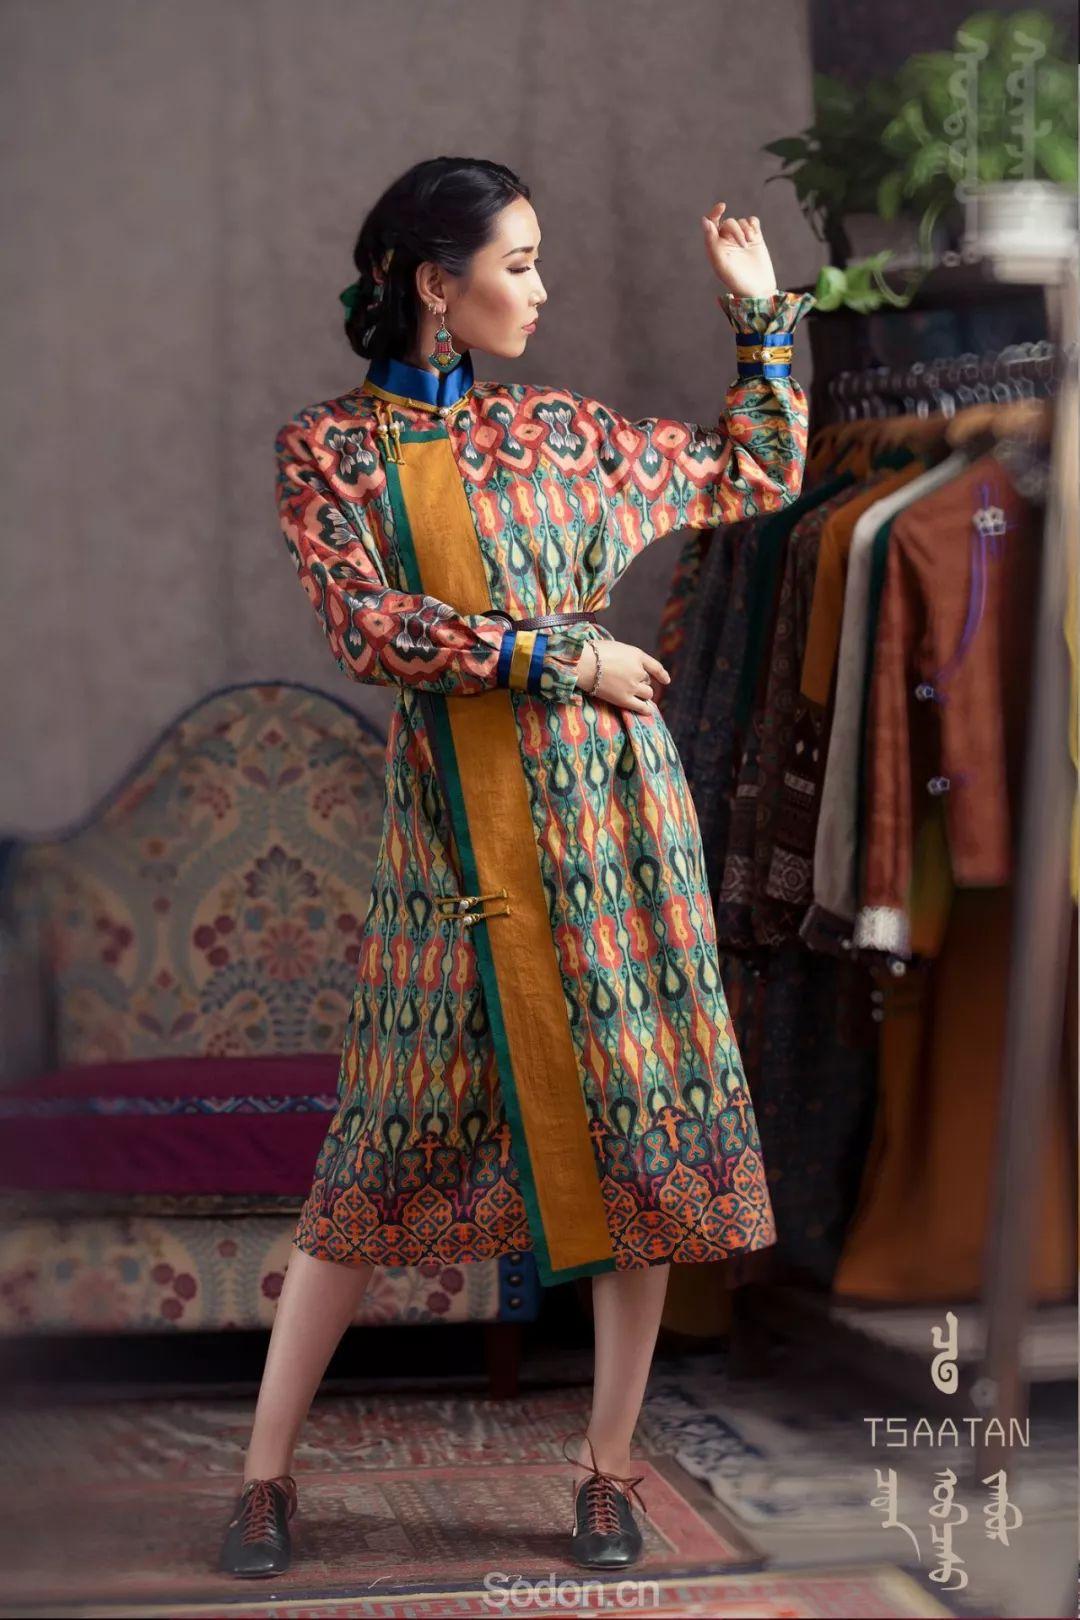 TSAATAN蒙古时装 2019夏季新款首发 第68张